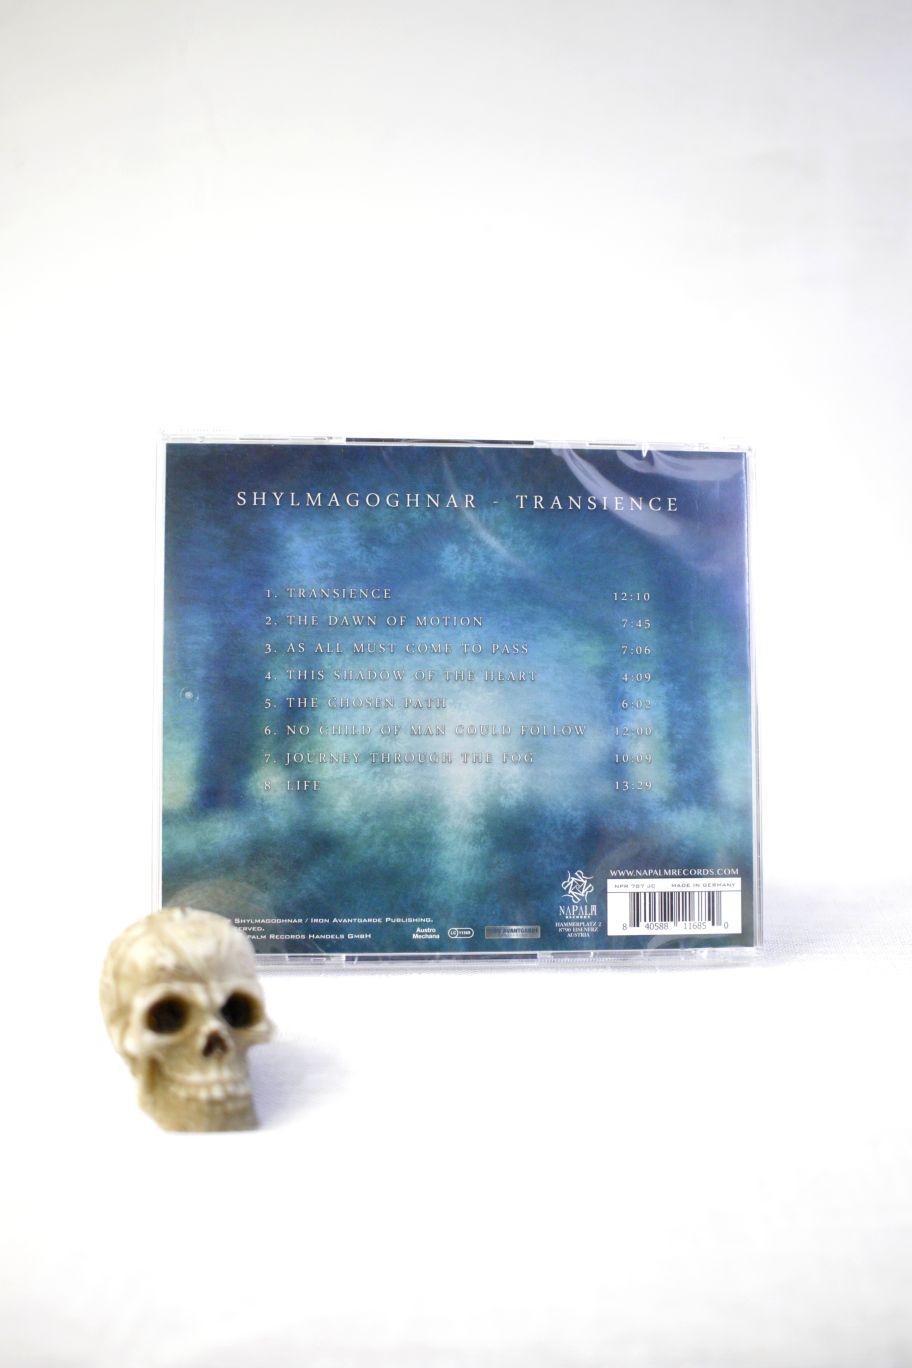 CDS SHYLMAGOGHNAR TRANSIENCE